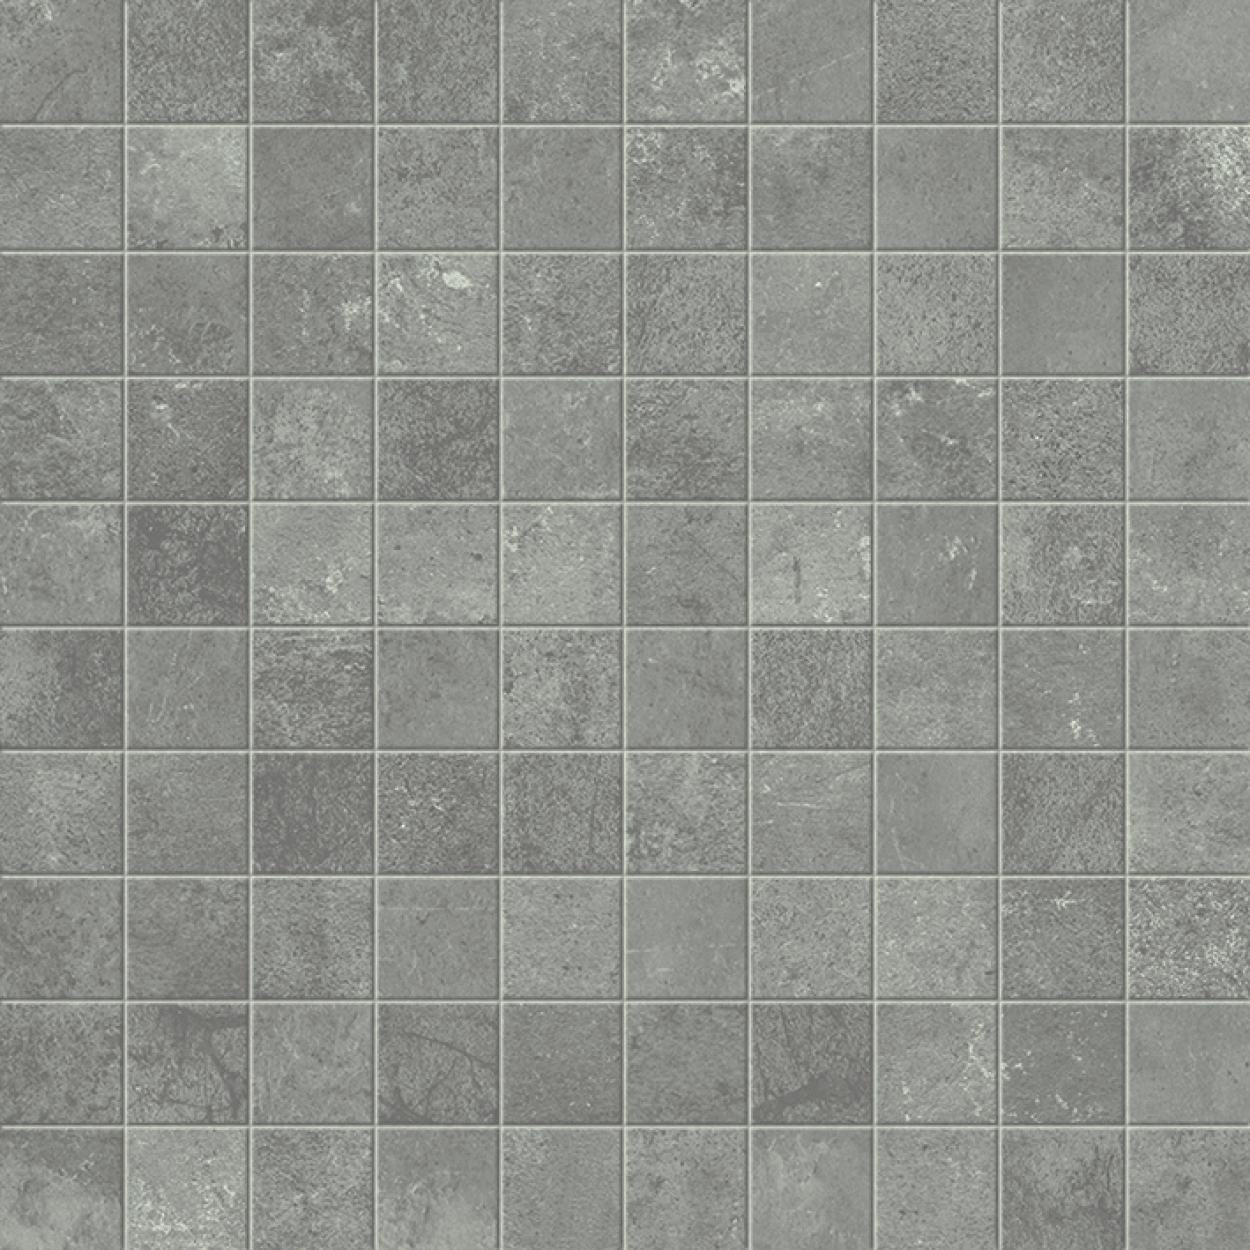 1 x 1 Midtown Brooklyn mosaic